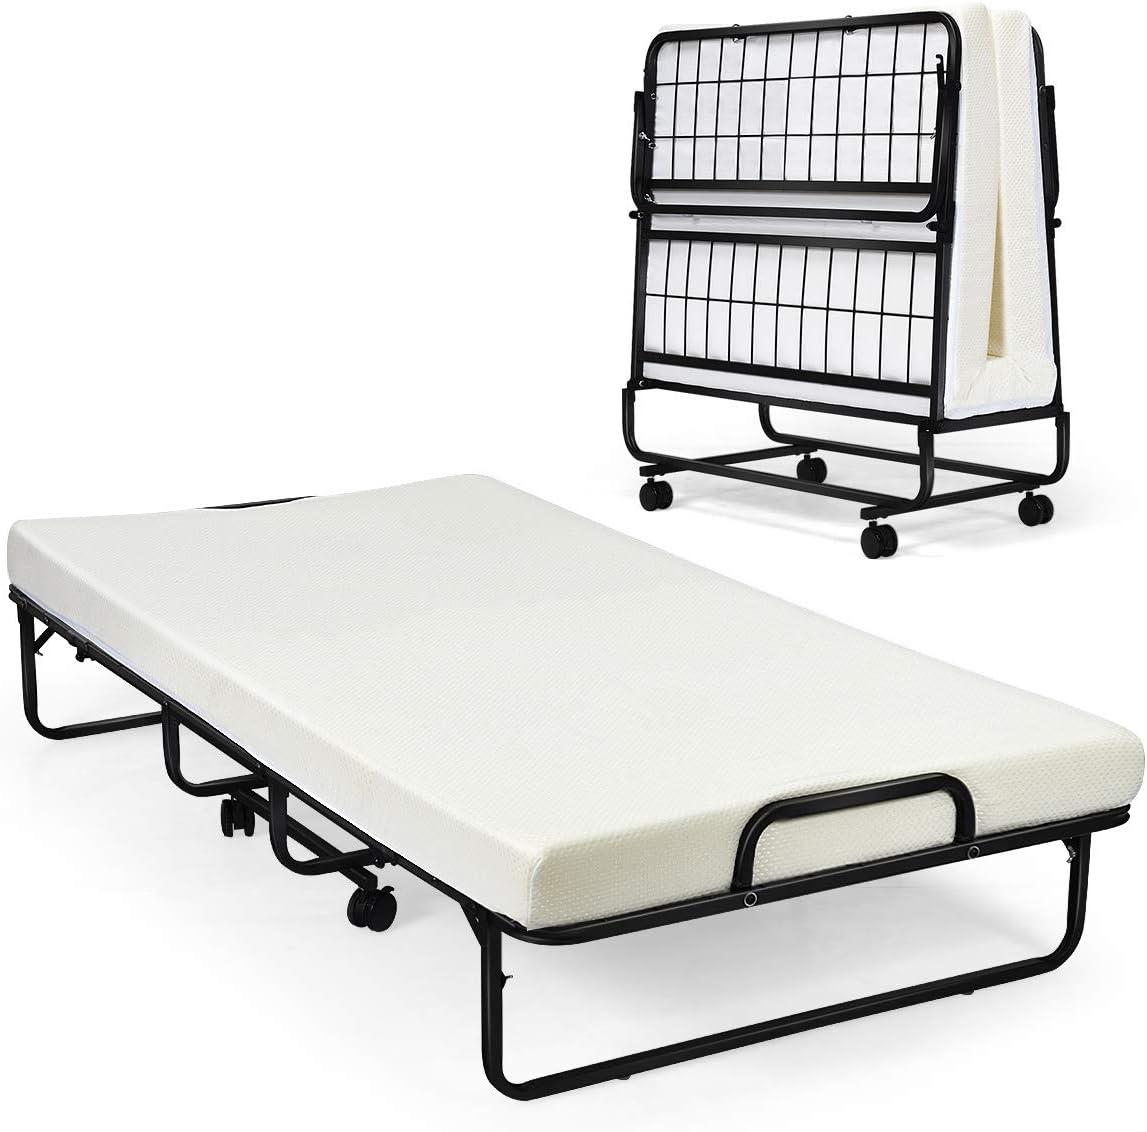 - Amazon.com: Giantex Metal Folding Bed With Mattress, Rollaway